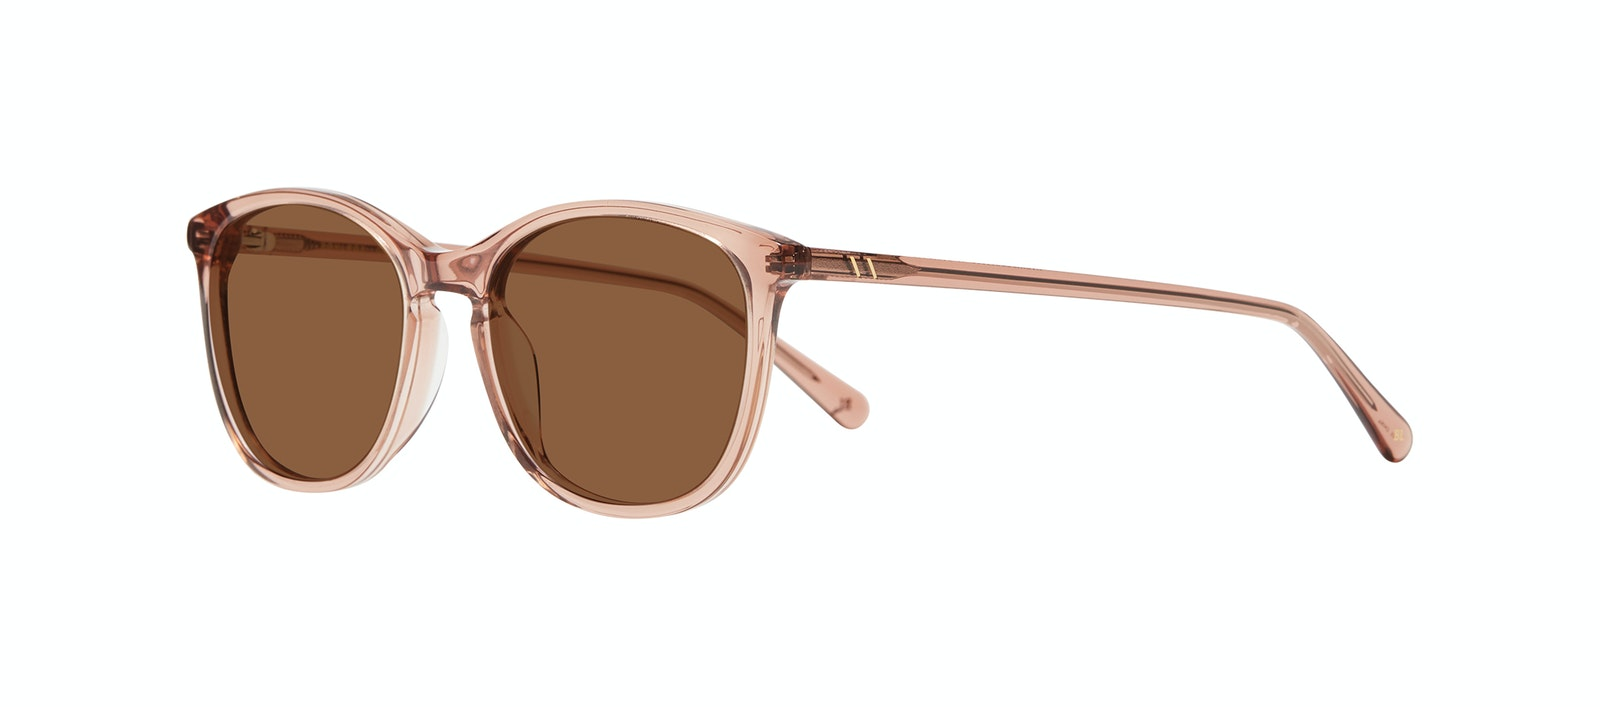 Affordable Fashion Glasses Rectangle Square Round Sunglasses Women Nadine M Rose Tilt